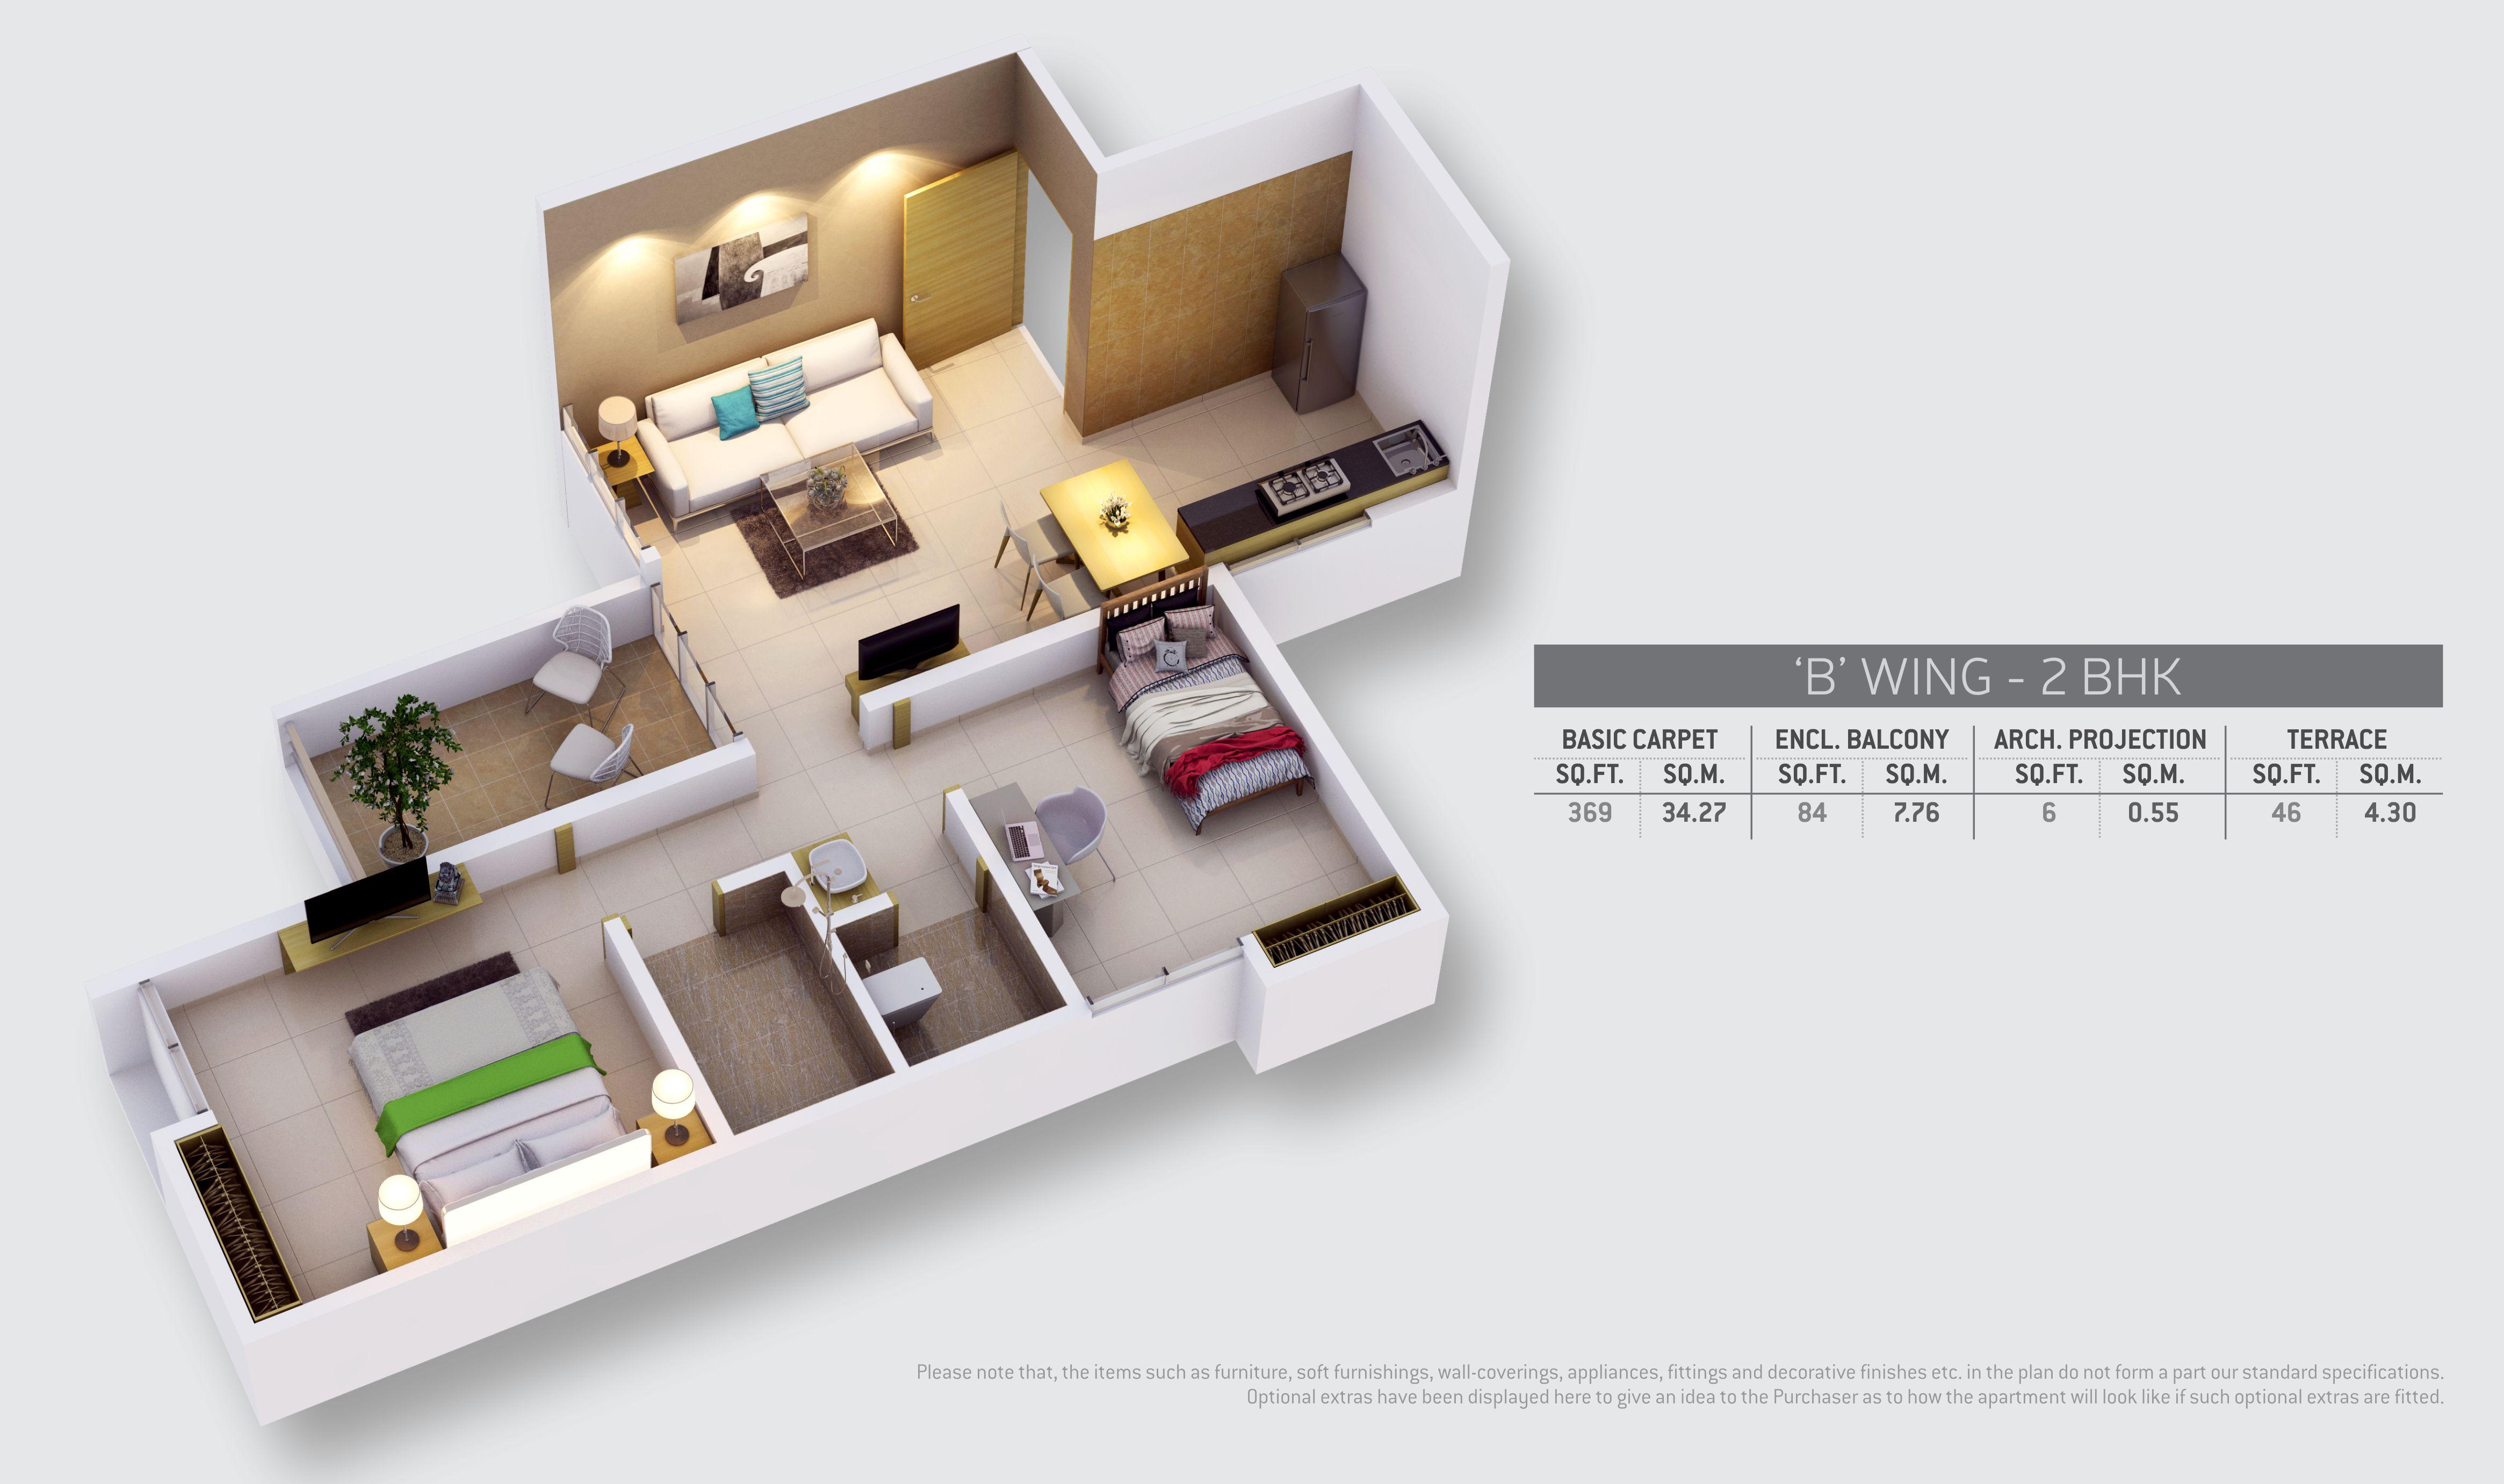 2 BHK flats in Wagholi Floor Plan